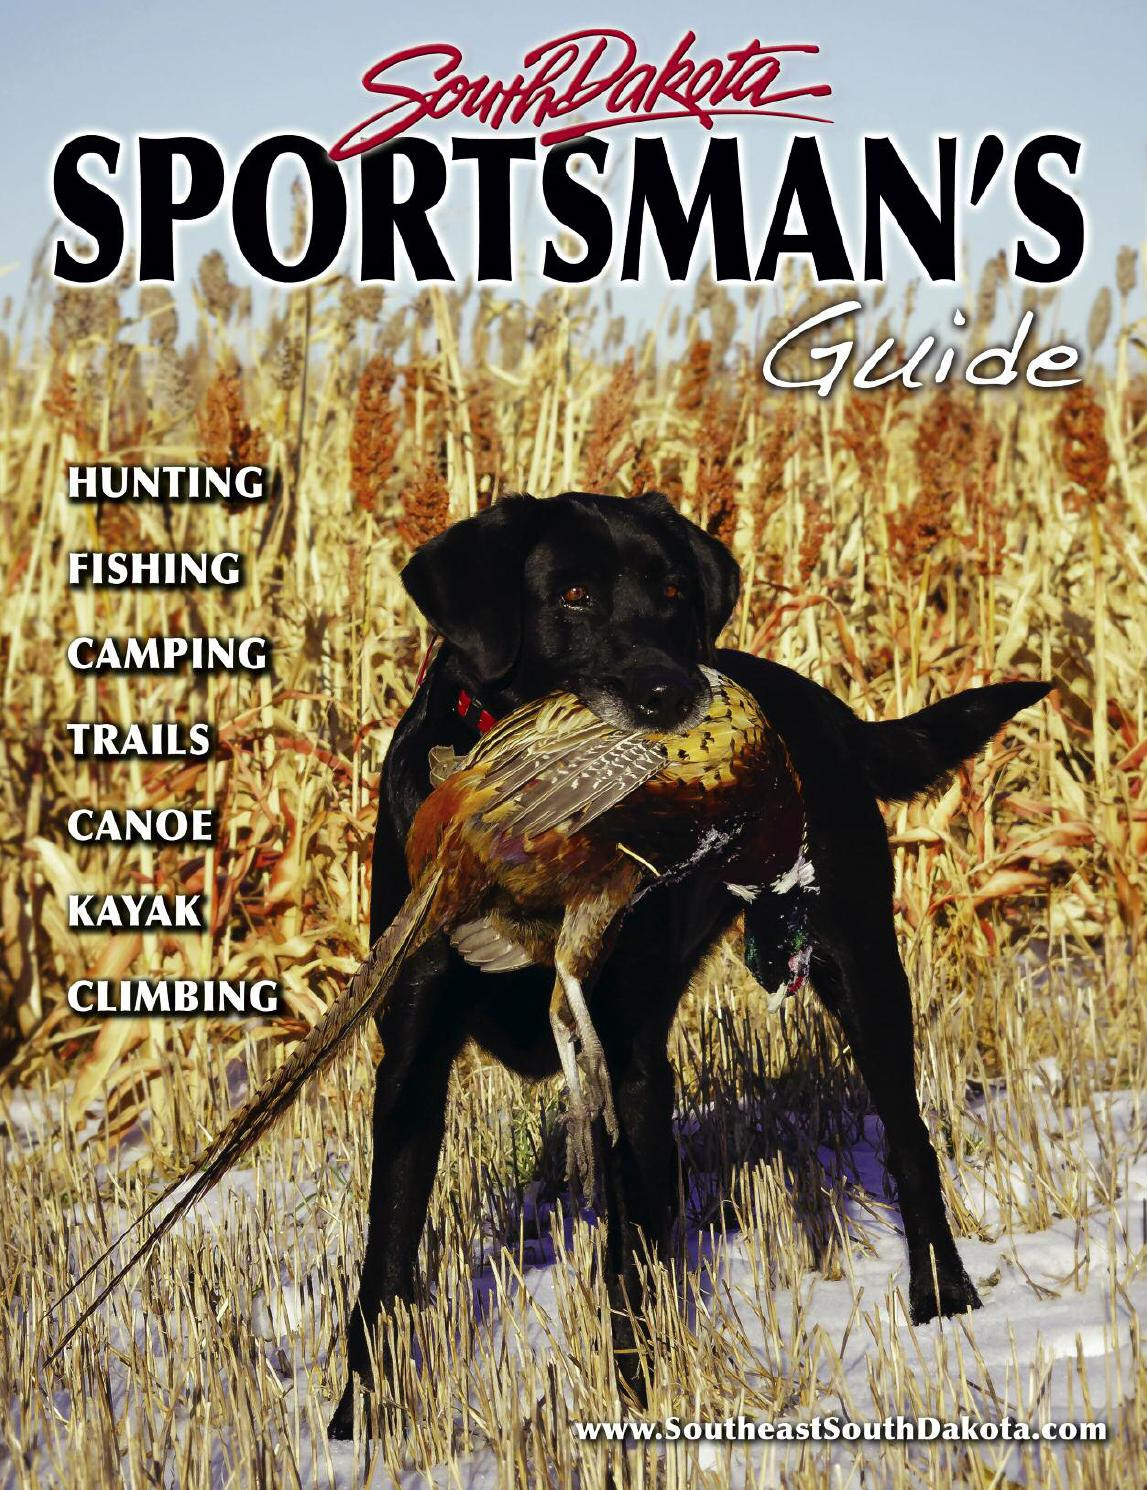 2015-16 South Dakota Sportsman's Guide by Southeast South Dakota - issuu